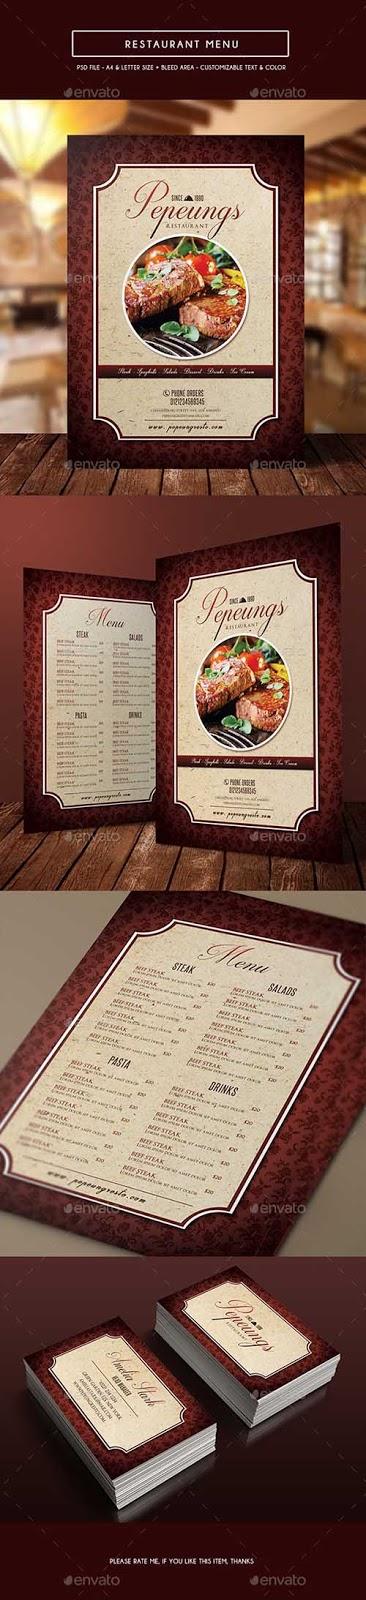 قائمة طعام لمطعم PSD، ملف PSD لقائمة طعام، ملف PSD جاهز